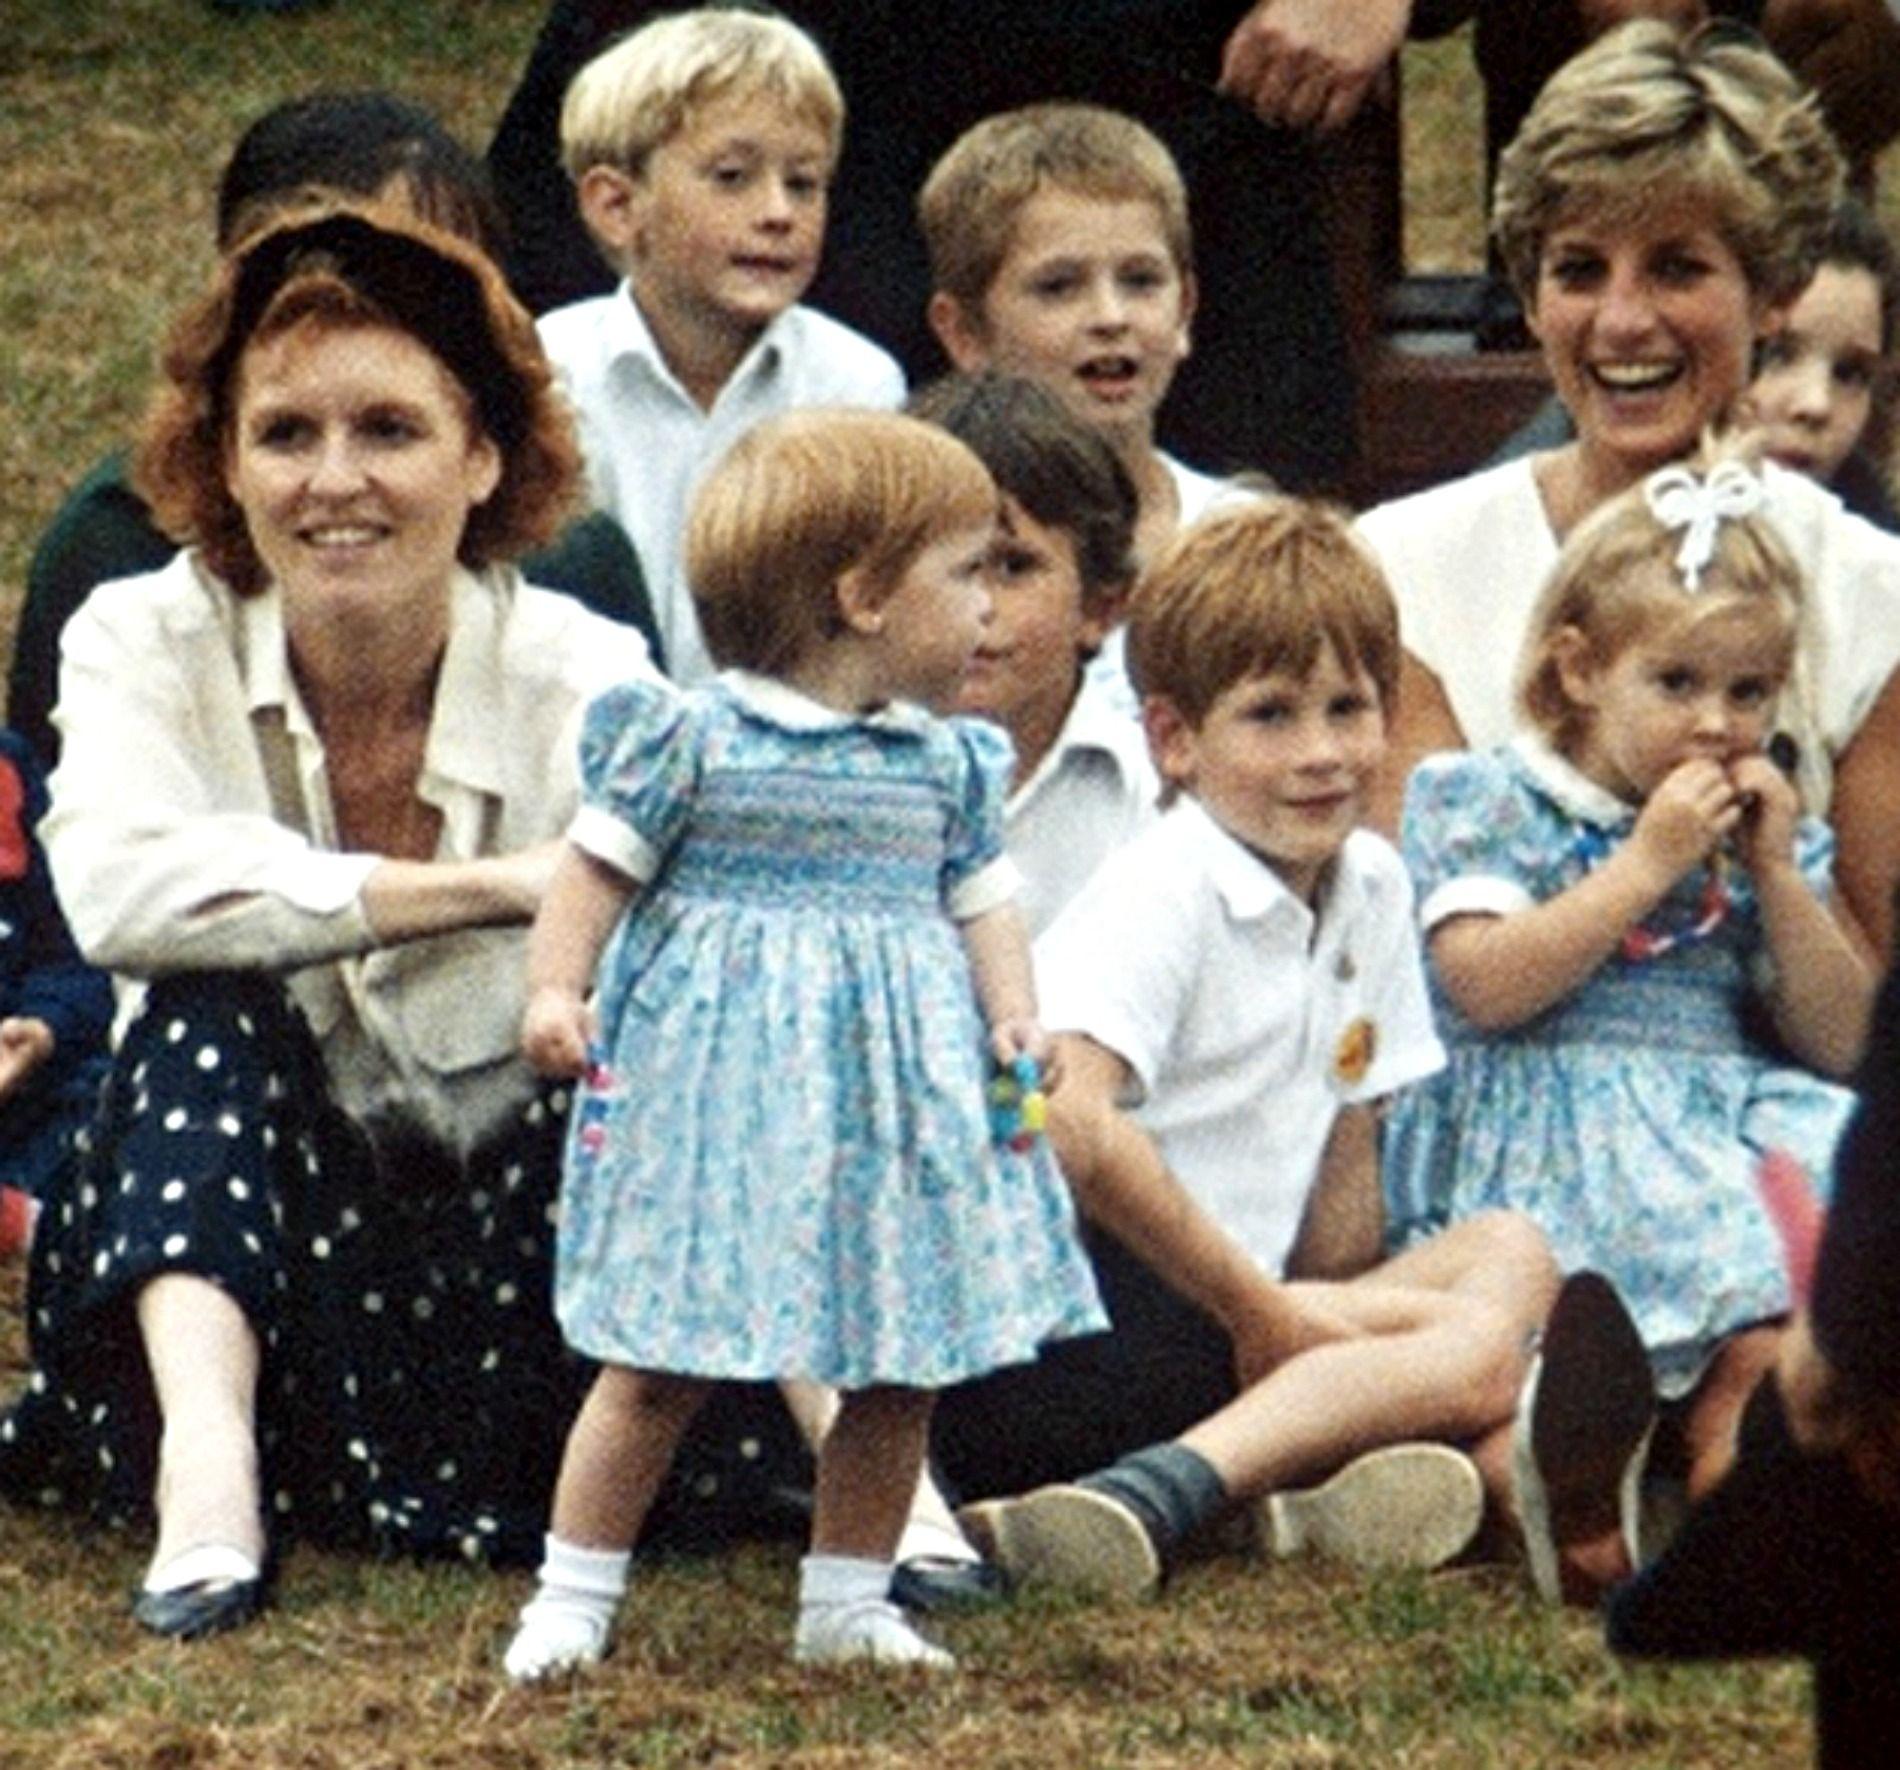 Princess Diana, Fergie, and, I think, Beatrice, Eugenie